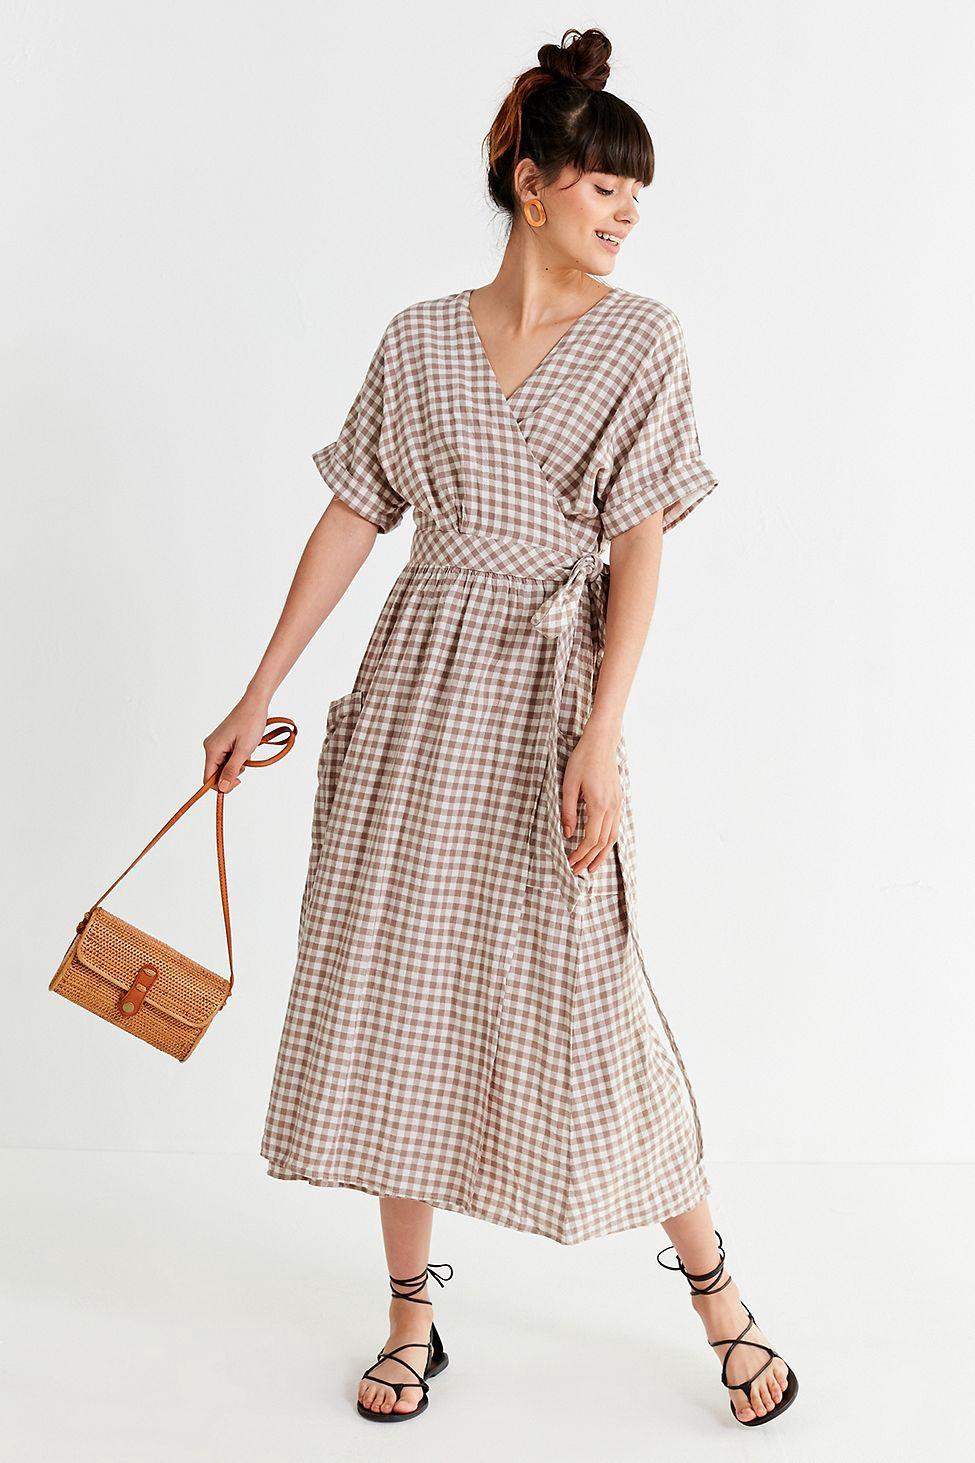 330a50c23a37 Urban Outfitters Uo Gabrielle Linen Midi Wrap Dress - Gold M ...